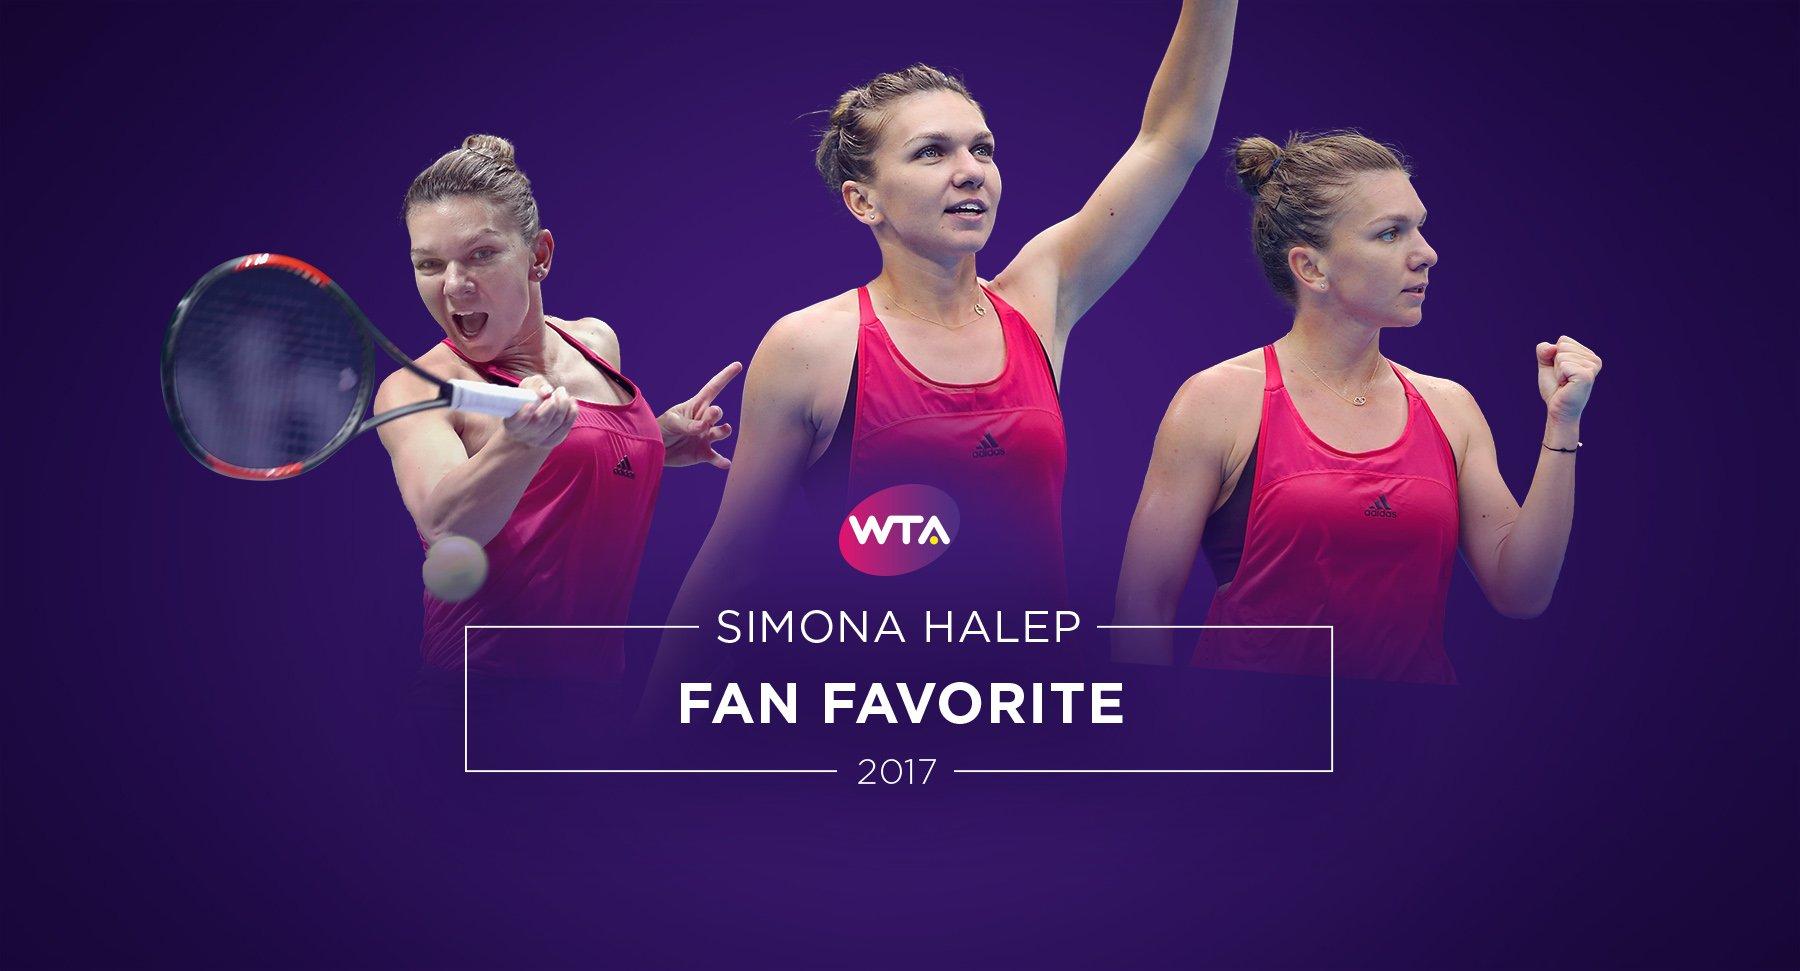 .@Simona_Halep is your #WTA Fan Favorite for 2017! ��  Congrats, Simona--> https://t.co/tLeyuyUFx4 https://t.co/hkN6It6InM